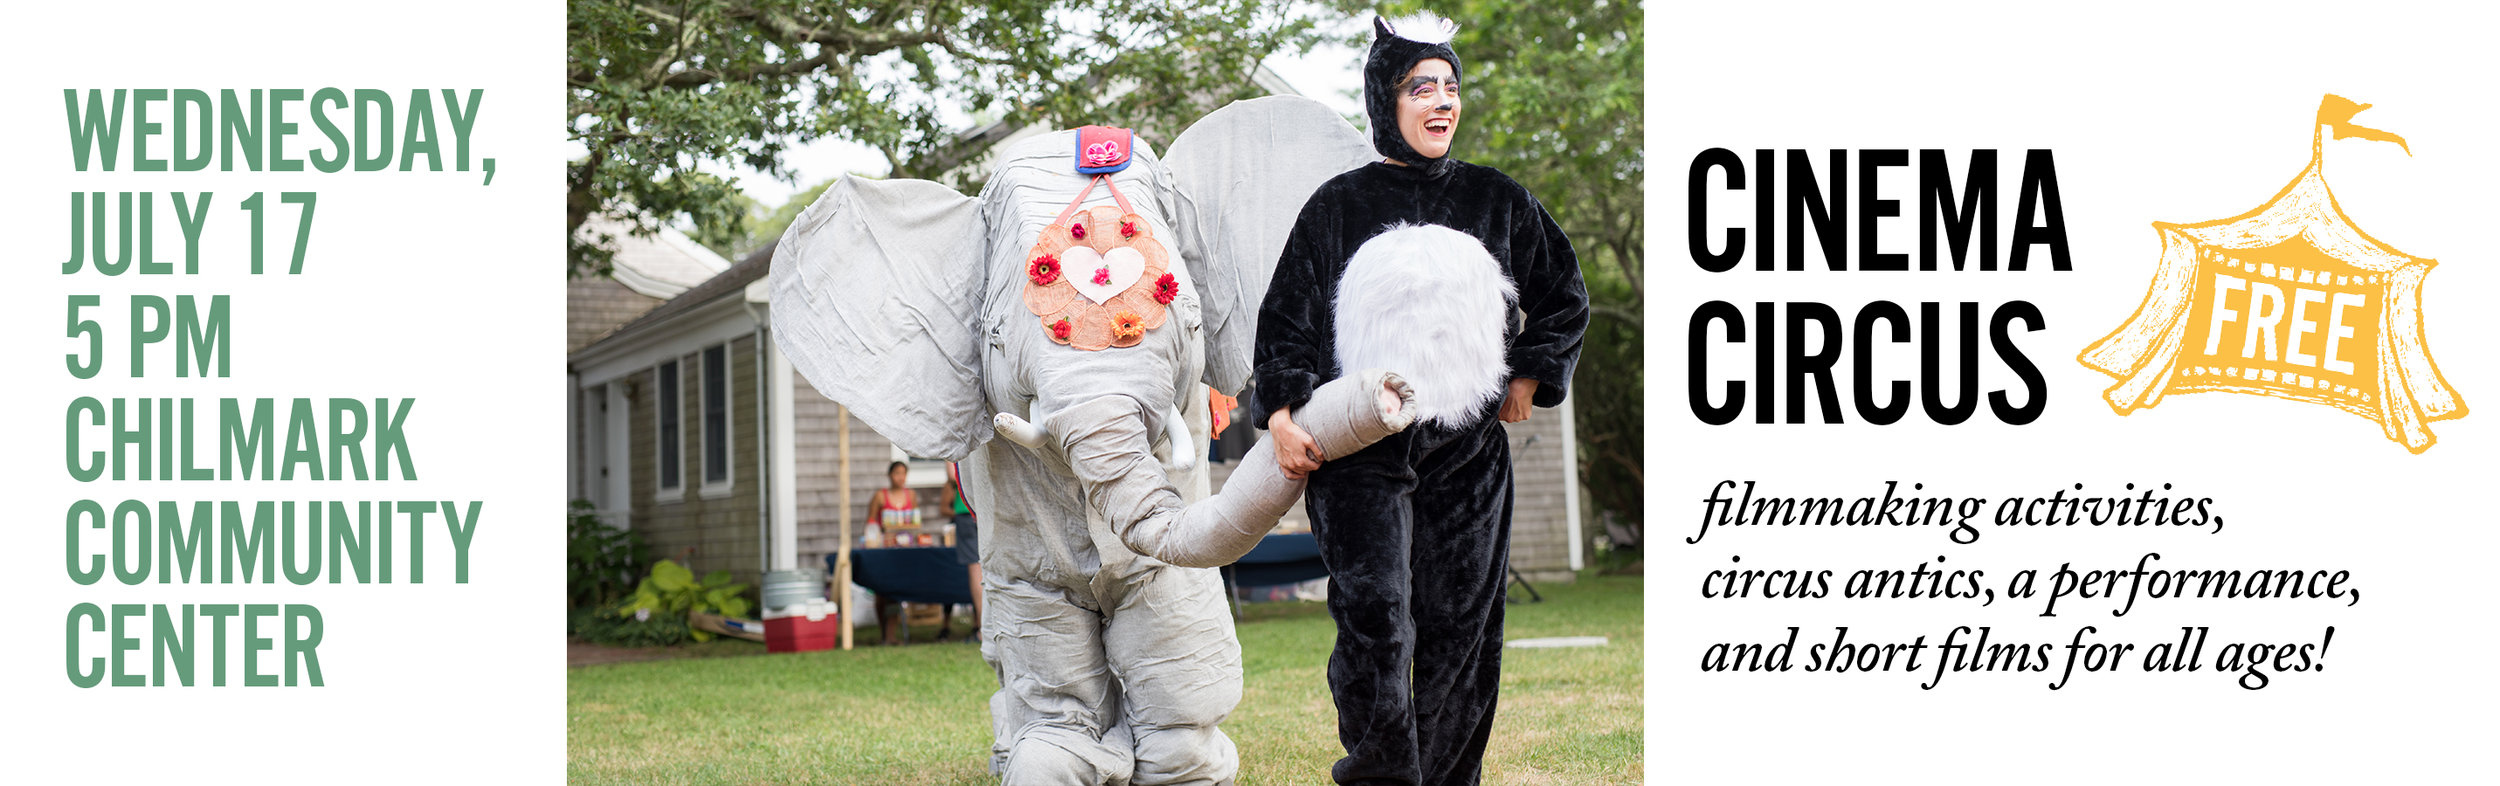 sfs19-circus-web-01-july17.jpg